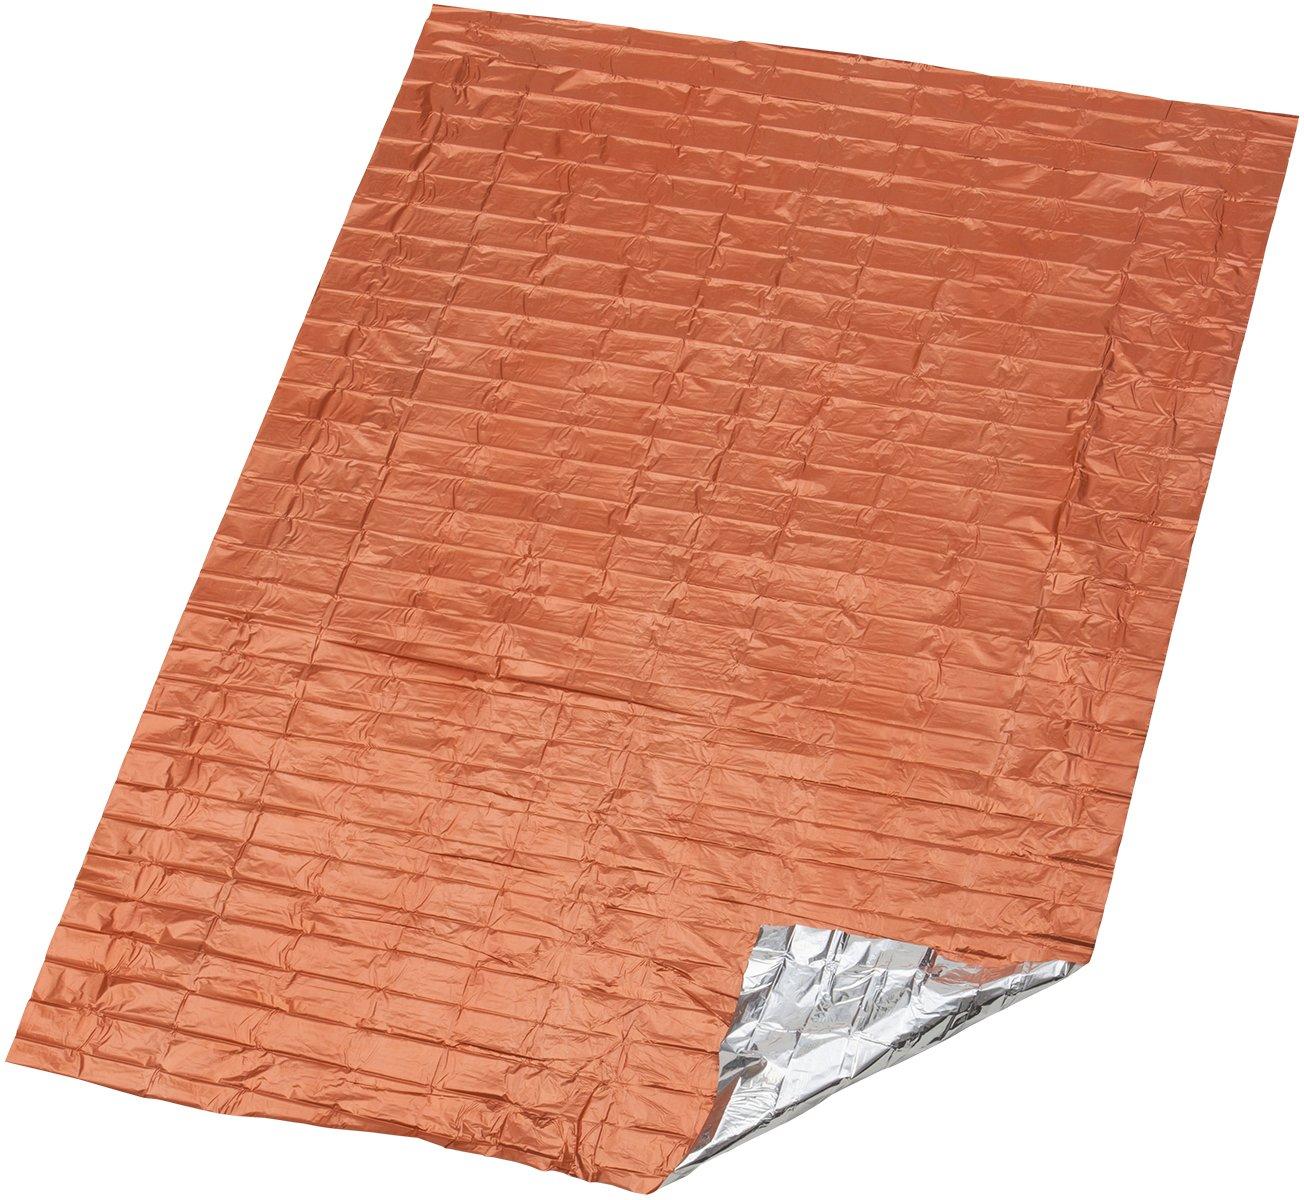 S.O.L. Survive Outdoors Longer 90 Percent Heat Reflective Emergency Blanket Adventure Medical Kits BMC0140-1222